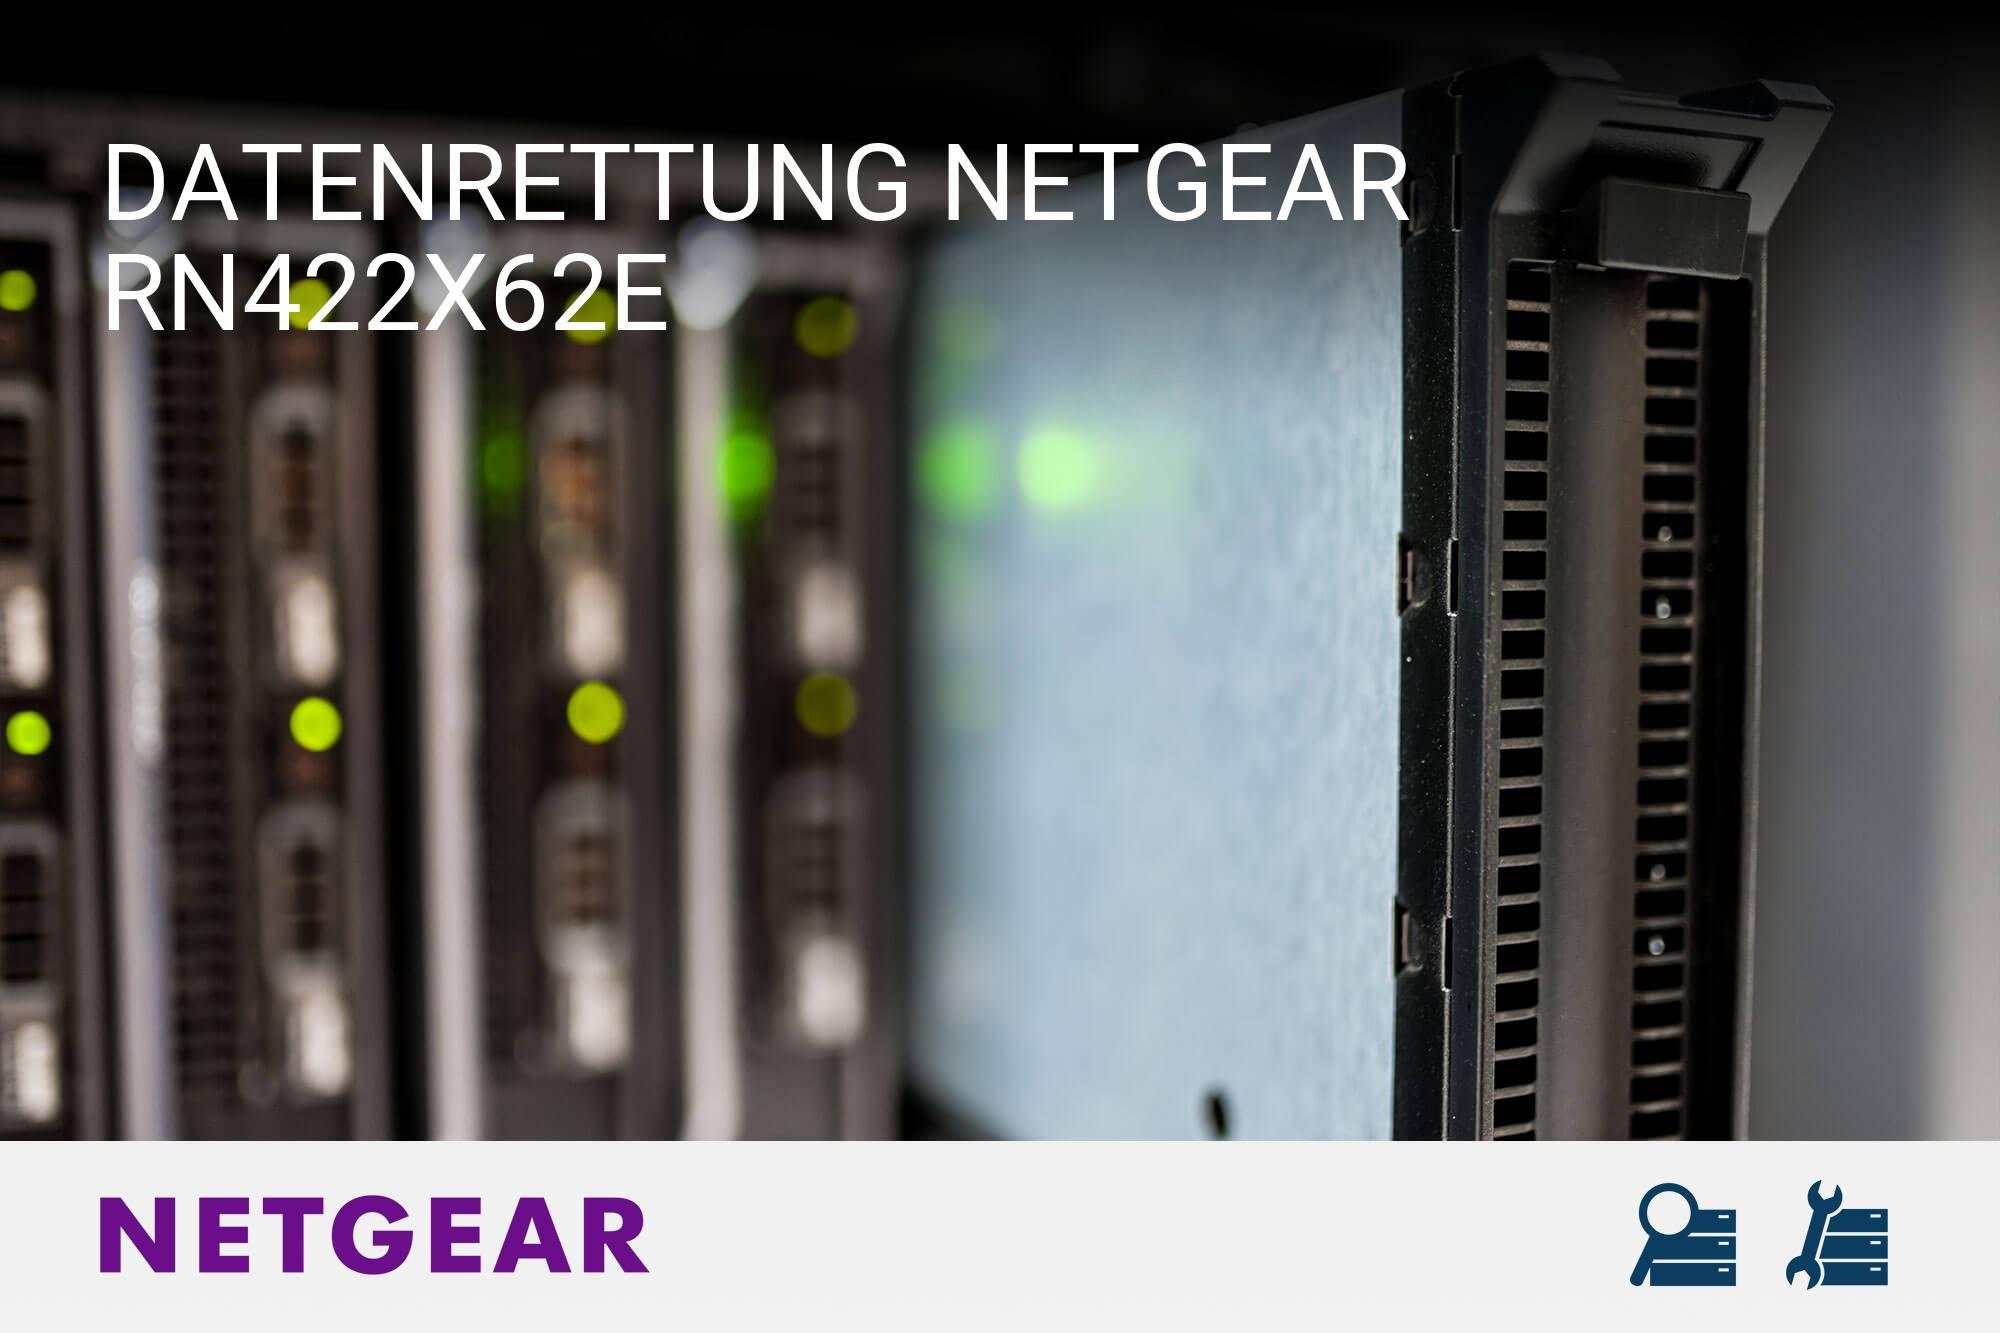 Netgear RN422X62E